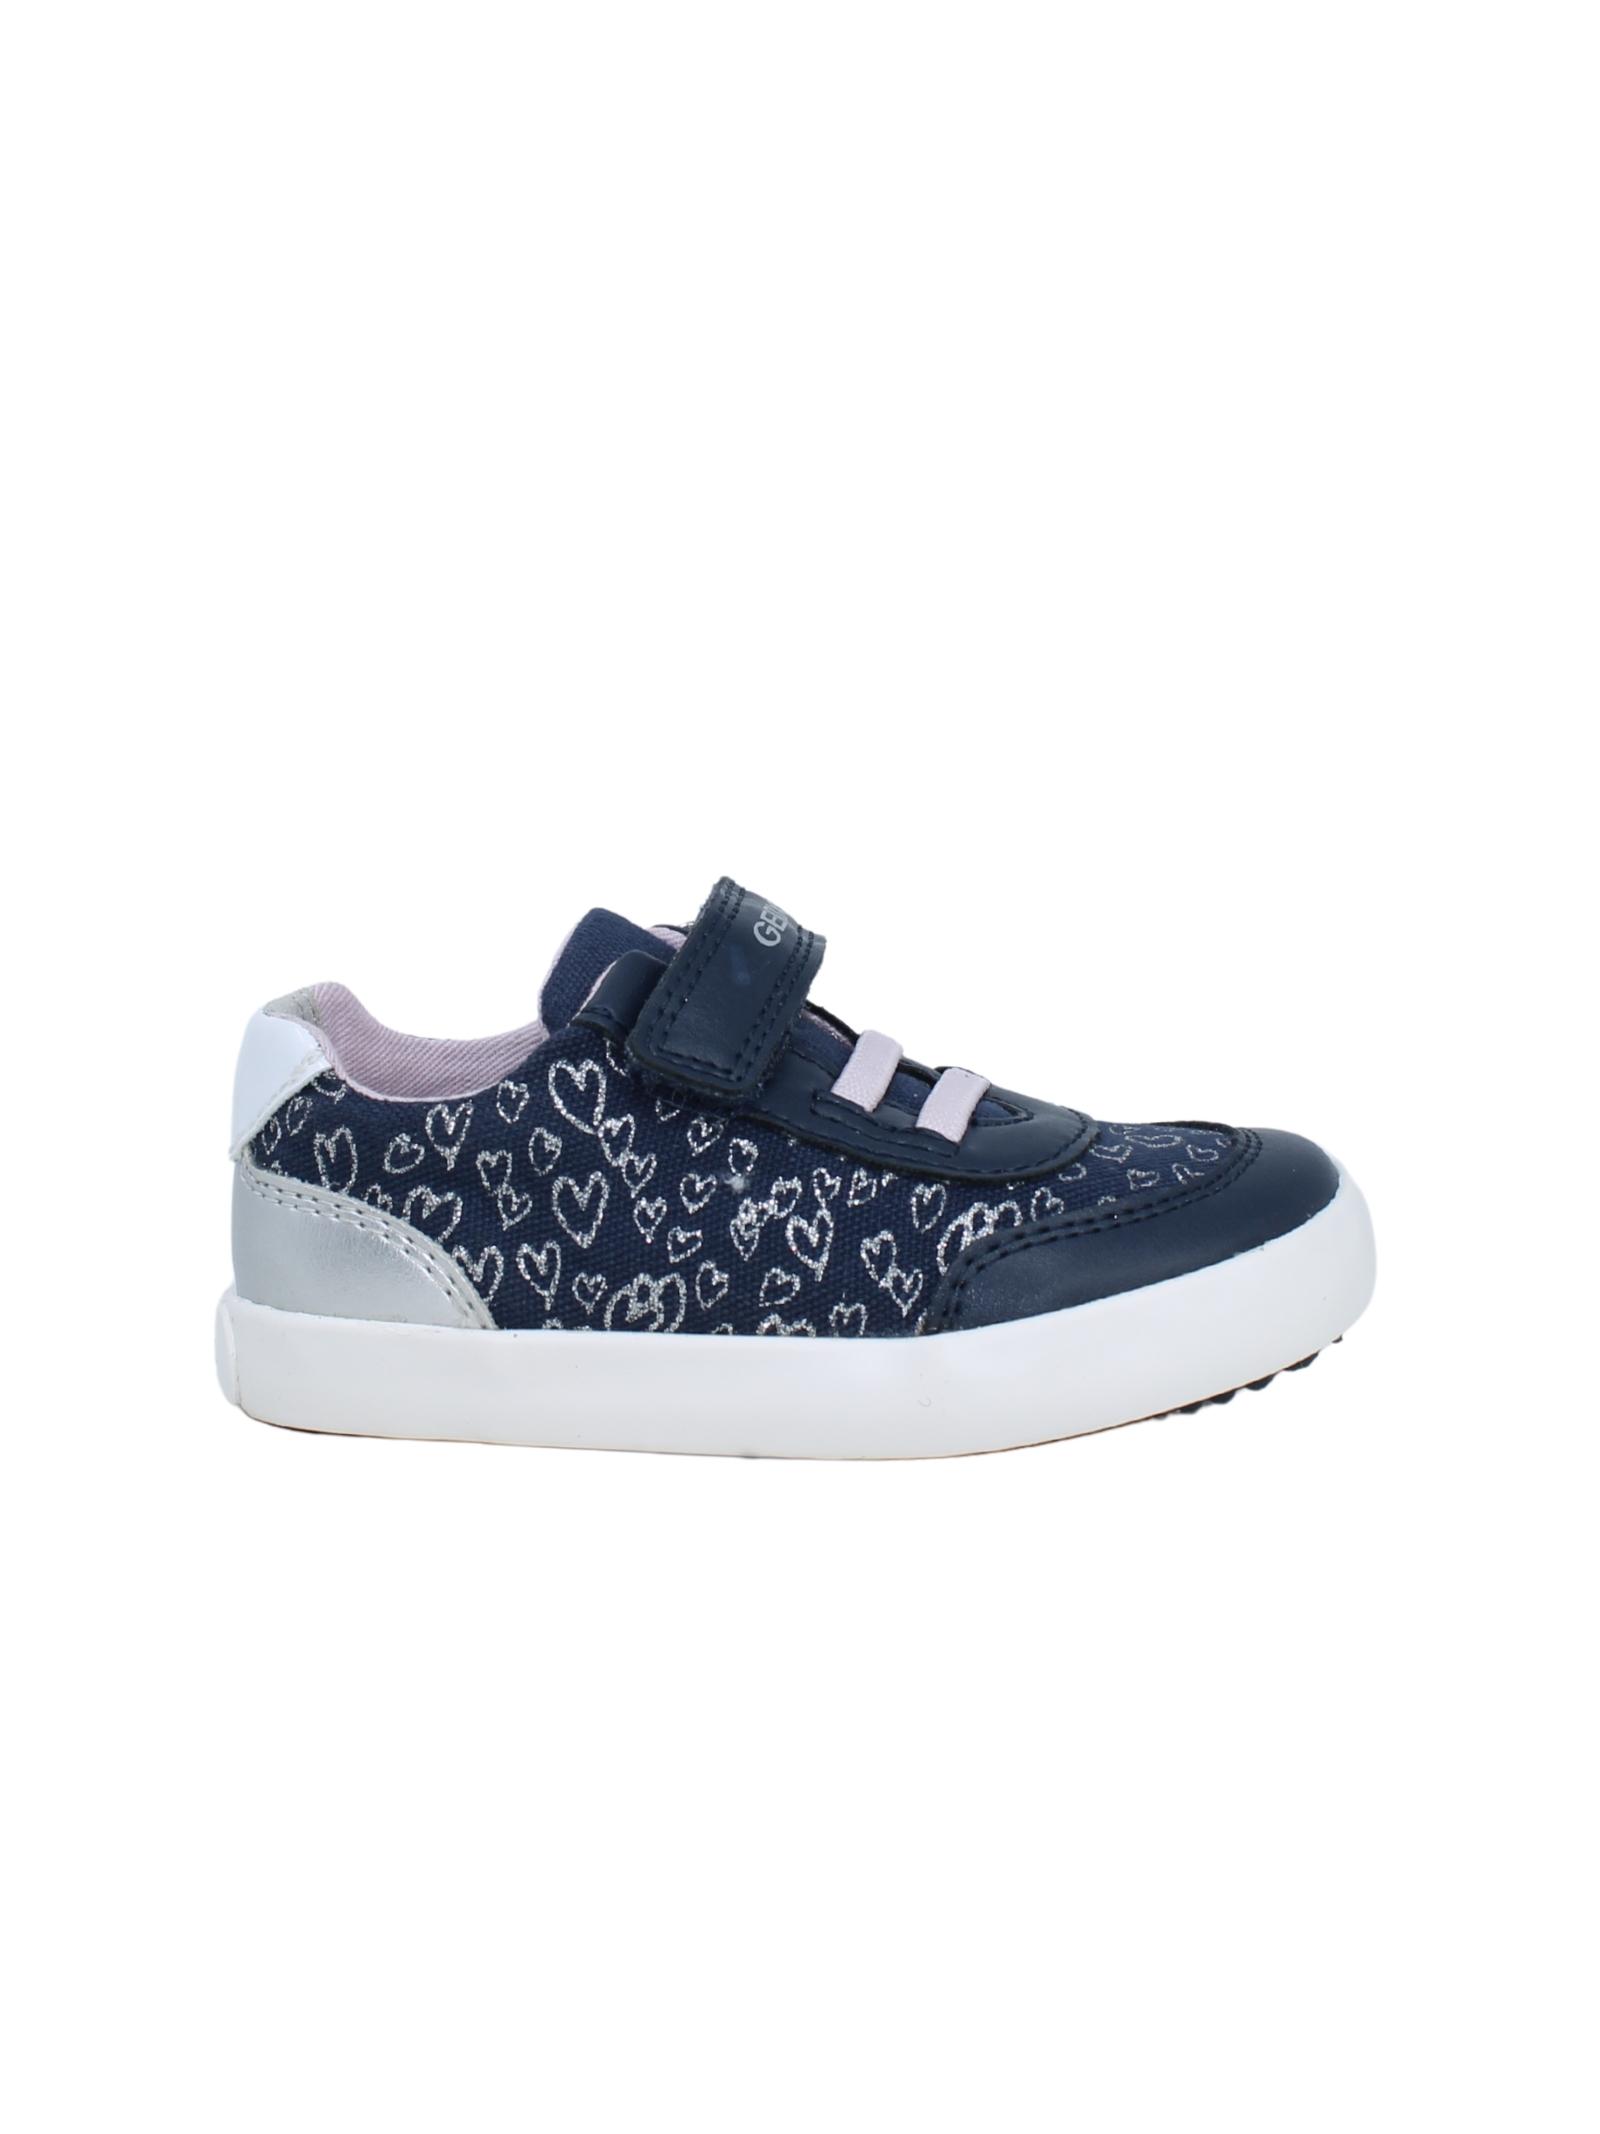 Sneakers Bambina Love Jeans GEOX KIDS | Sneakers | B021MA01054C0673